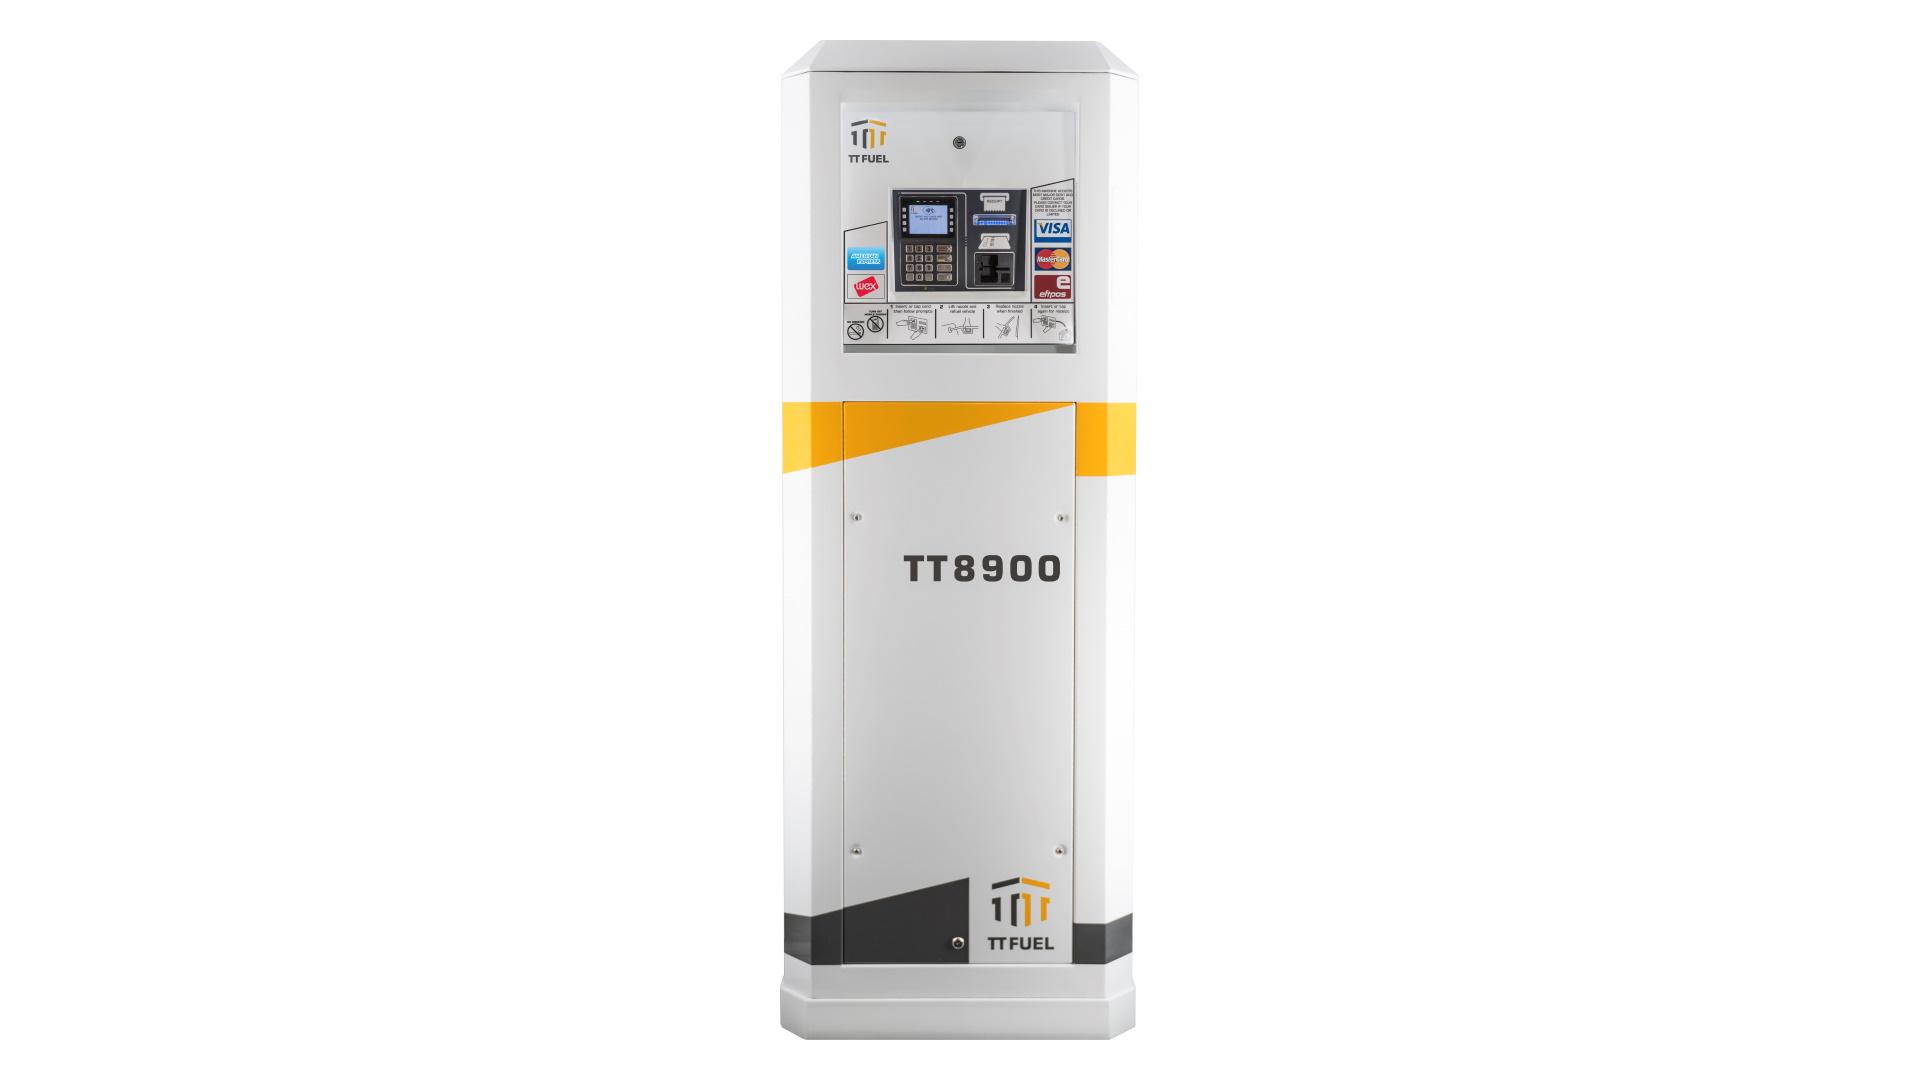 TT8900